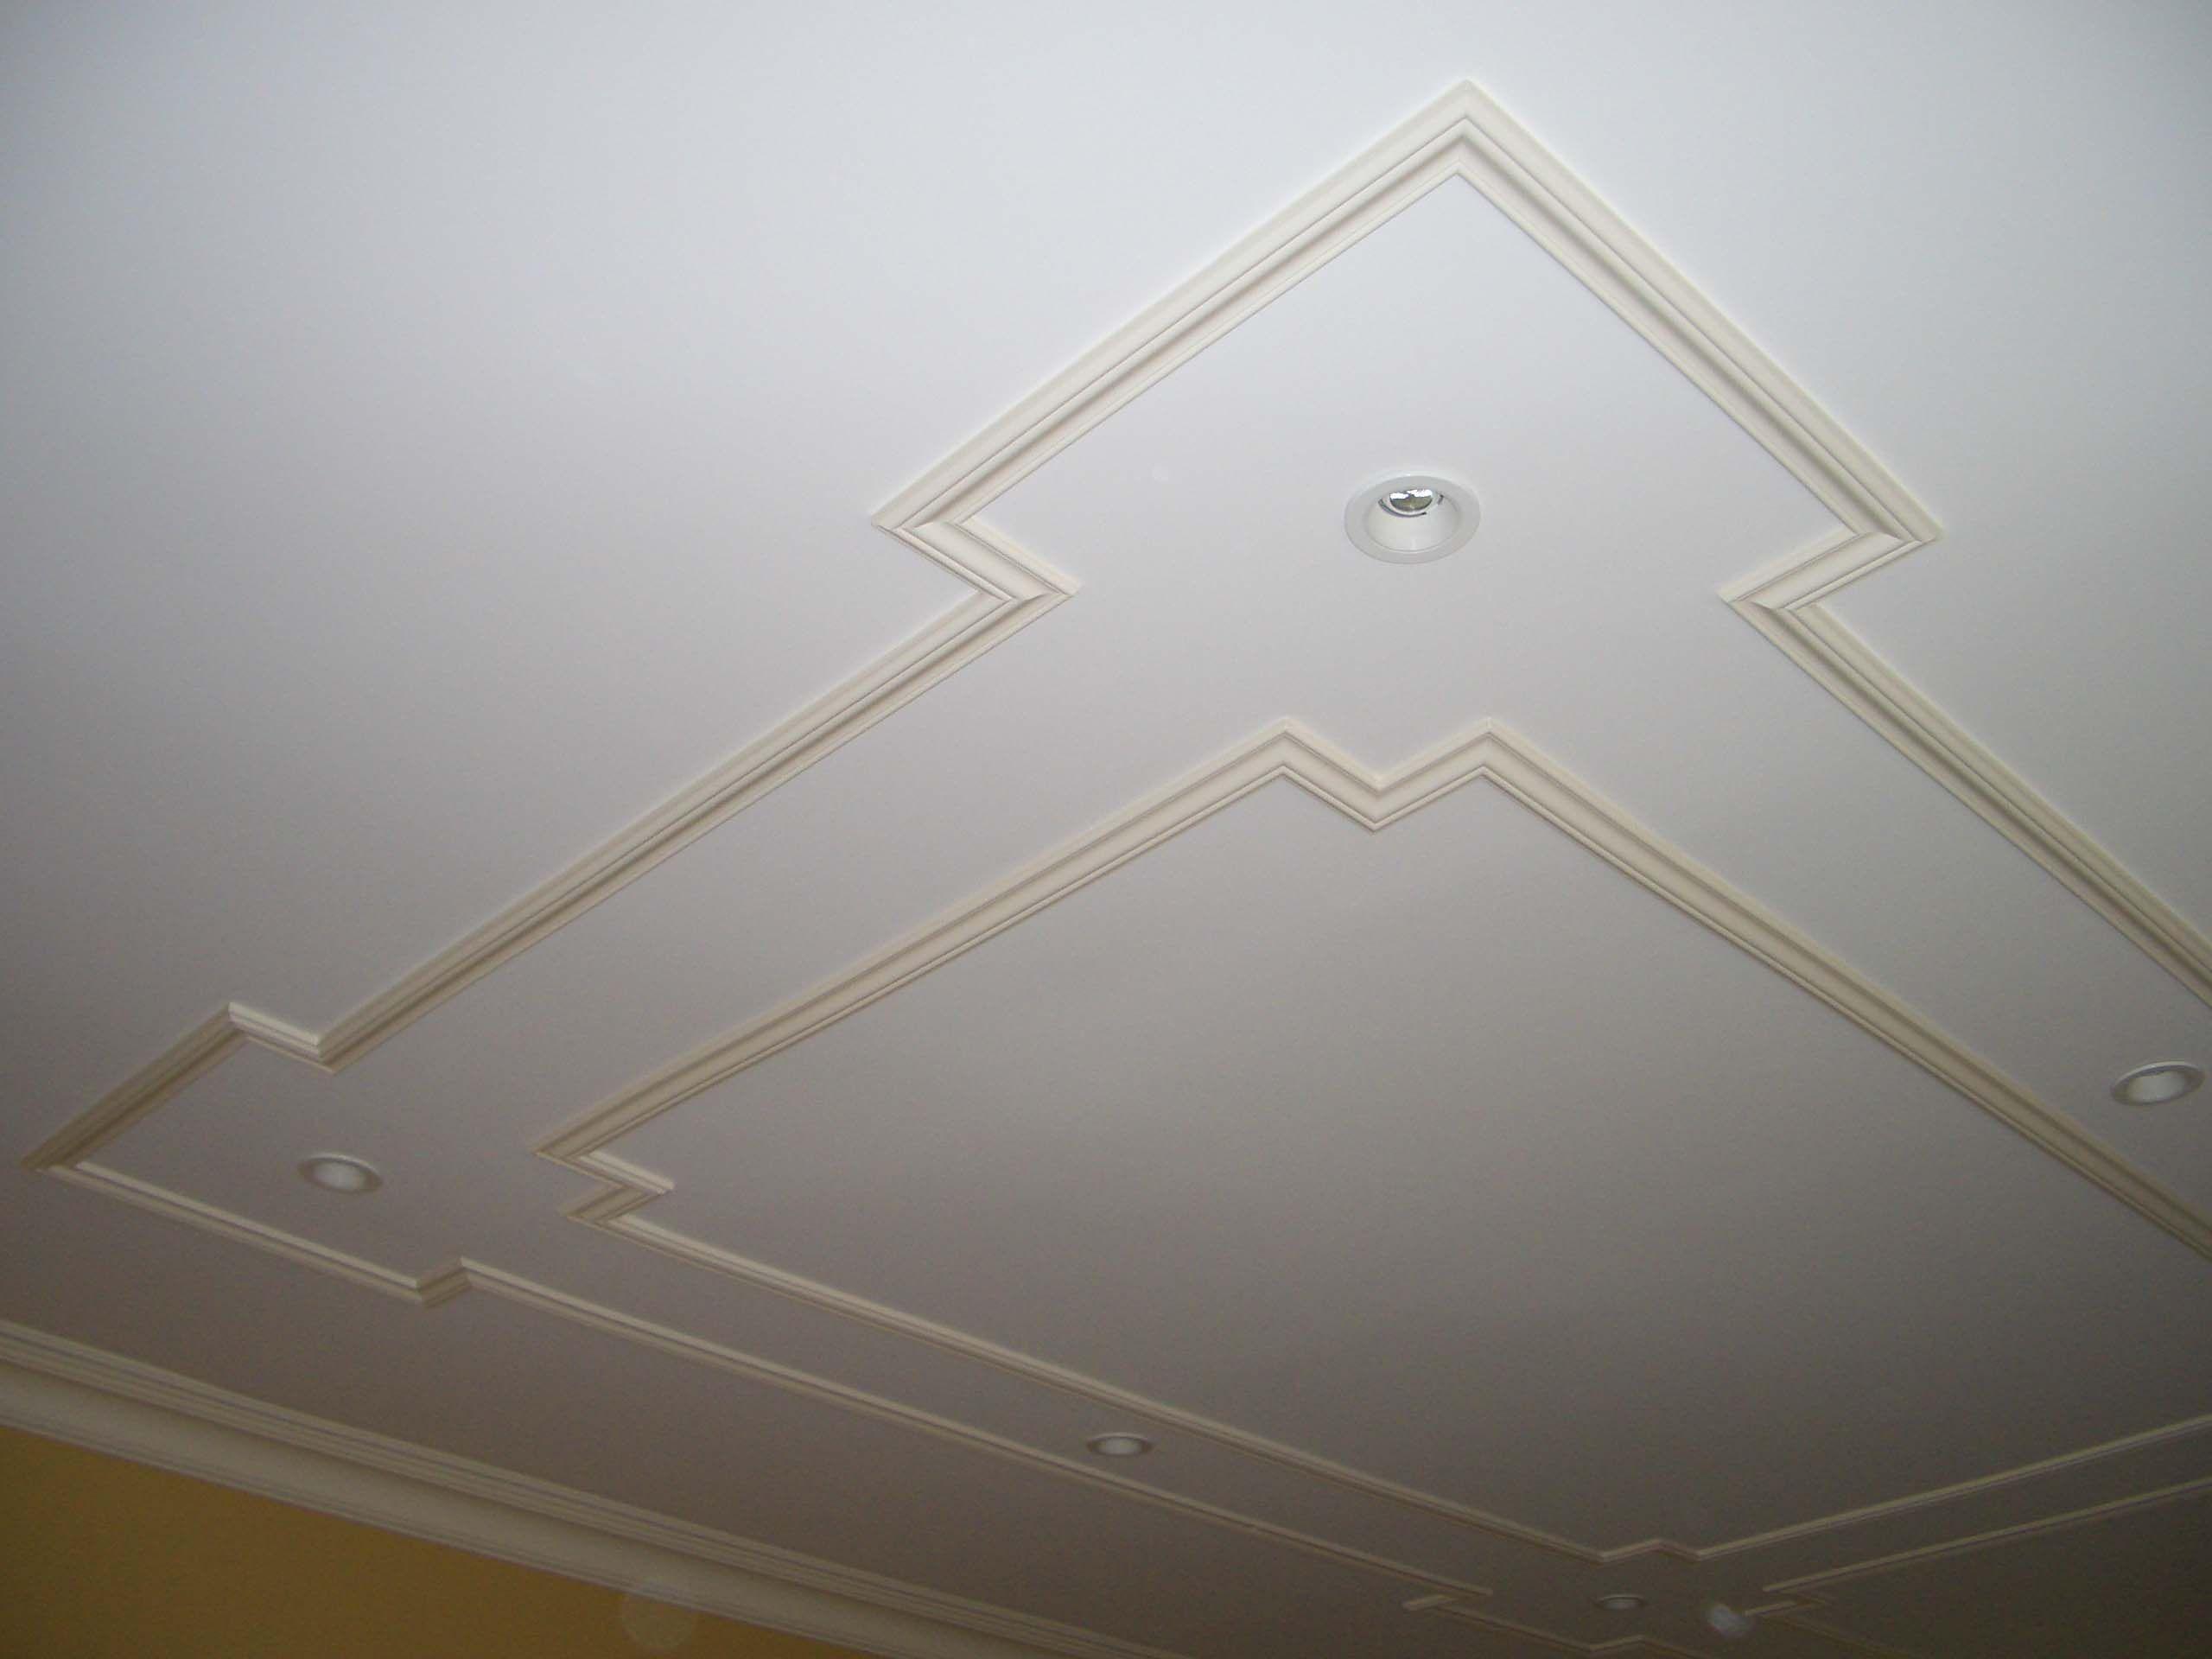 Ceiling Moldings House Ceiling Design Pop Ceiling Design